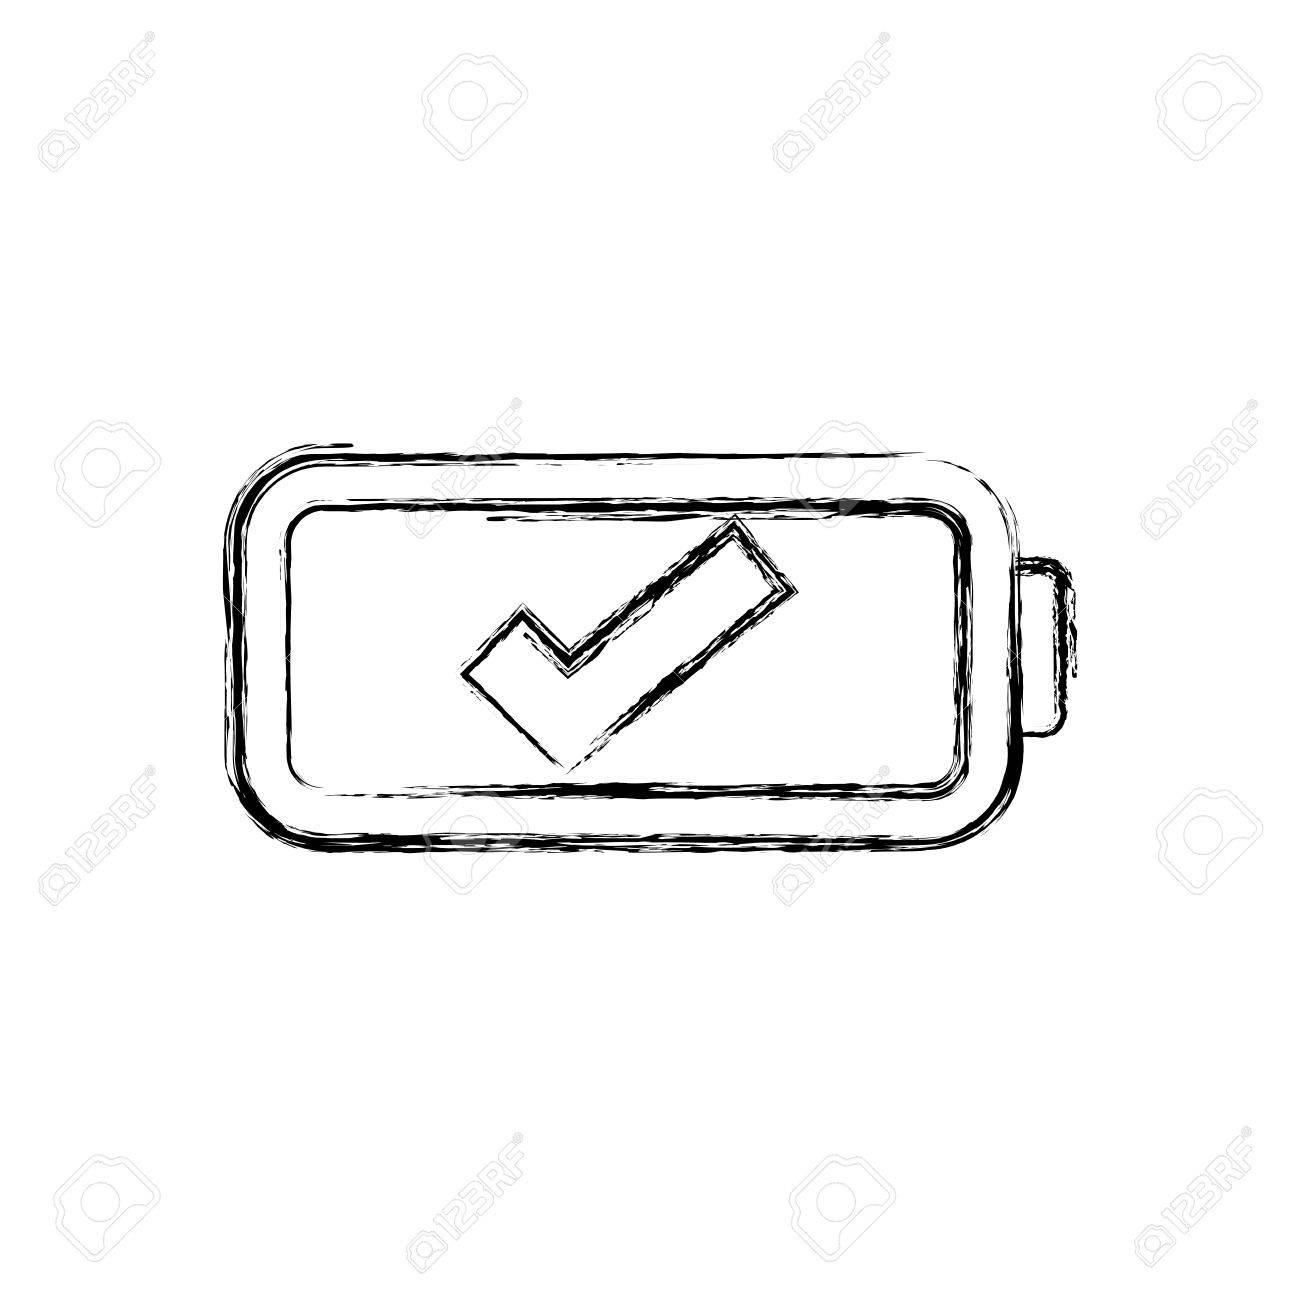 Nett Elektrische Symbol Batterie Ideen - Schaltplan Serie Circuit ...